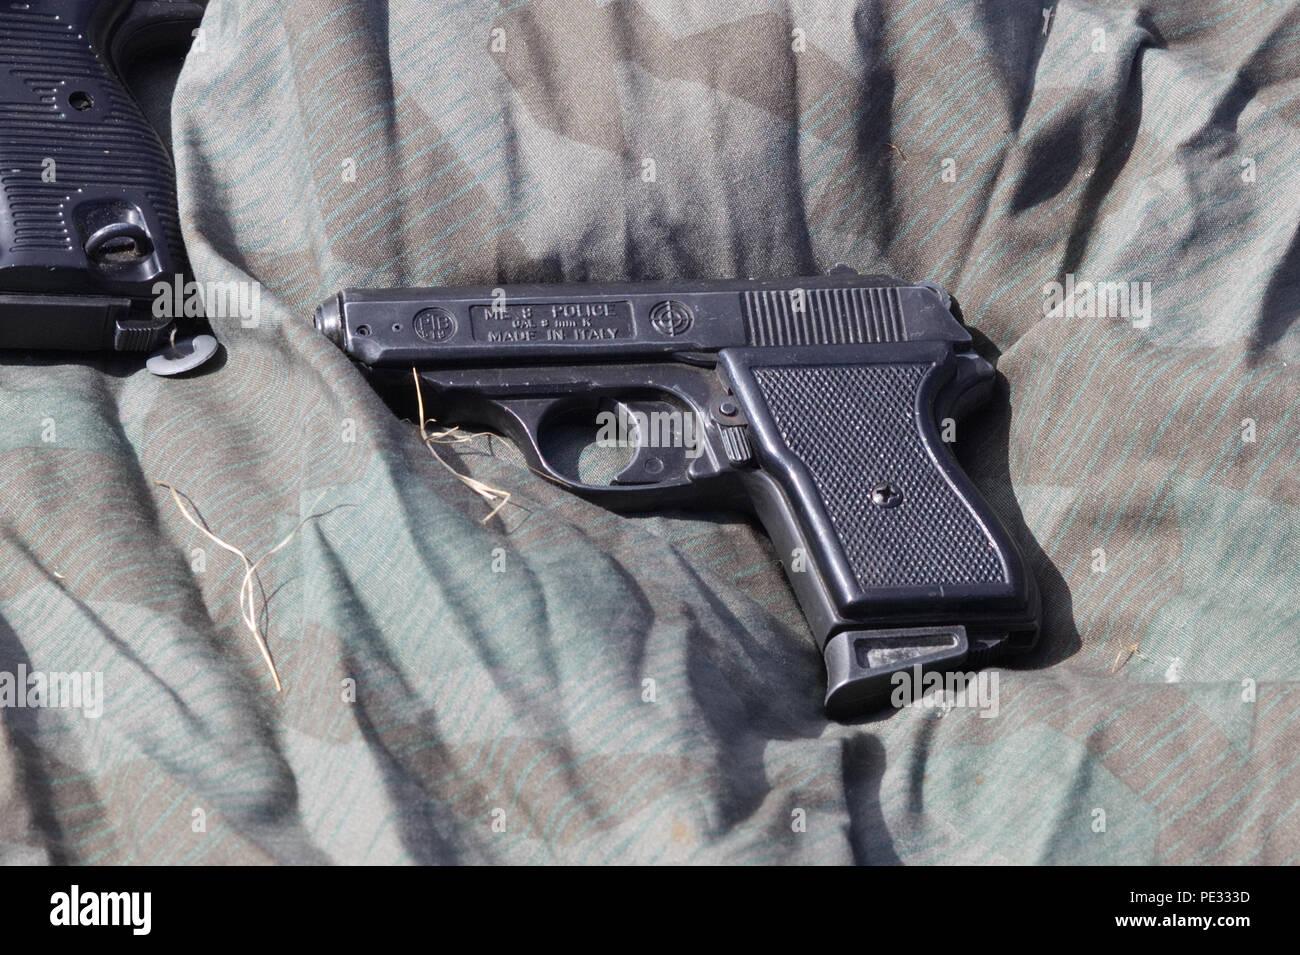 ME 8 Police issue 8mm K pistol PTB518 - Stock Image